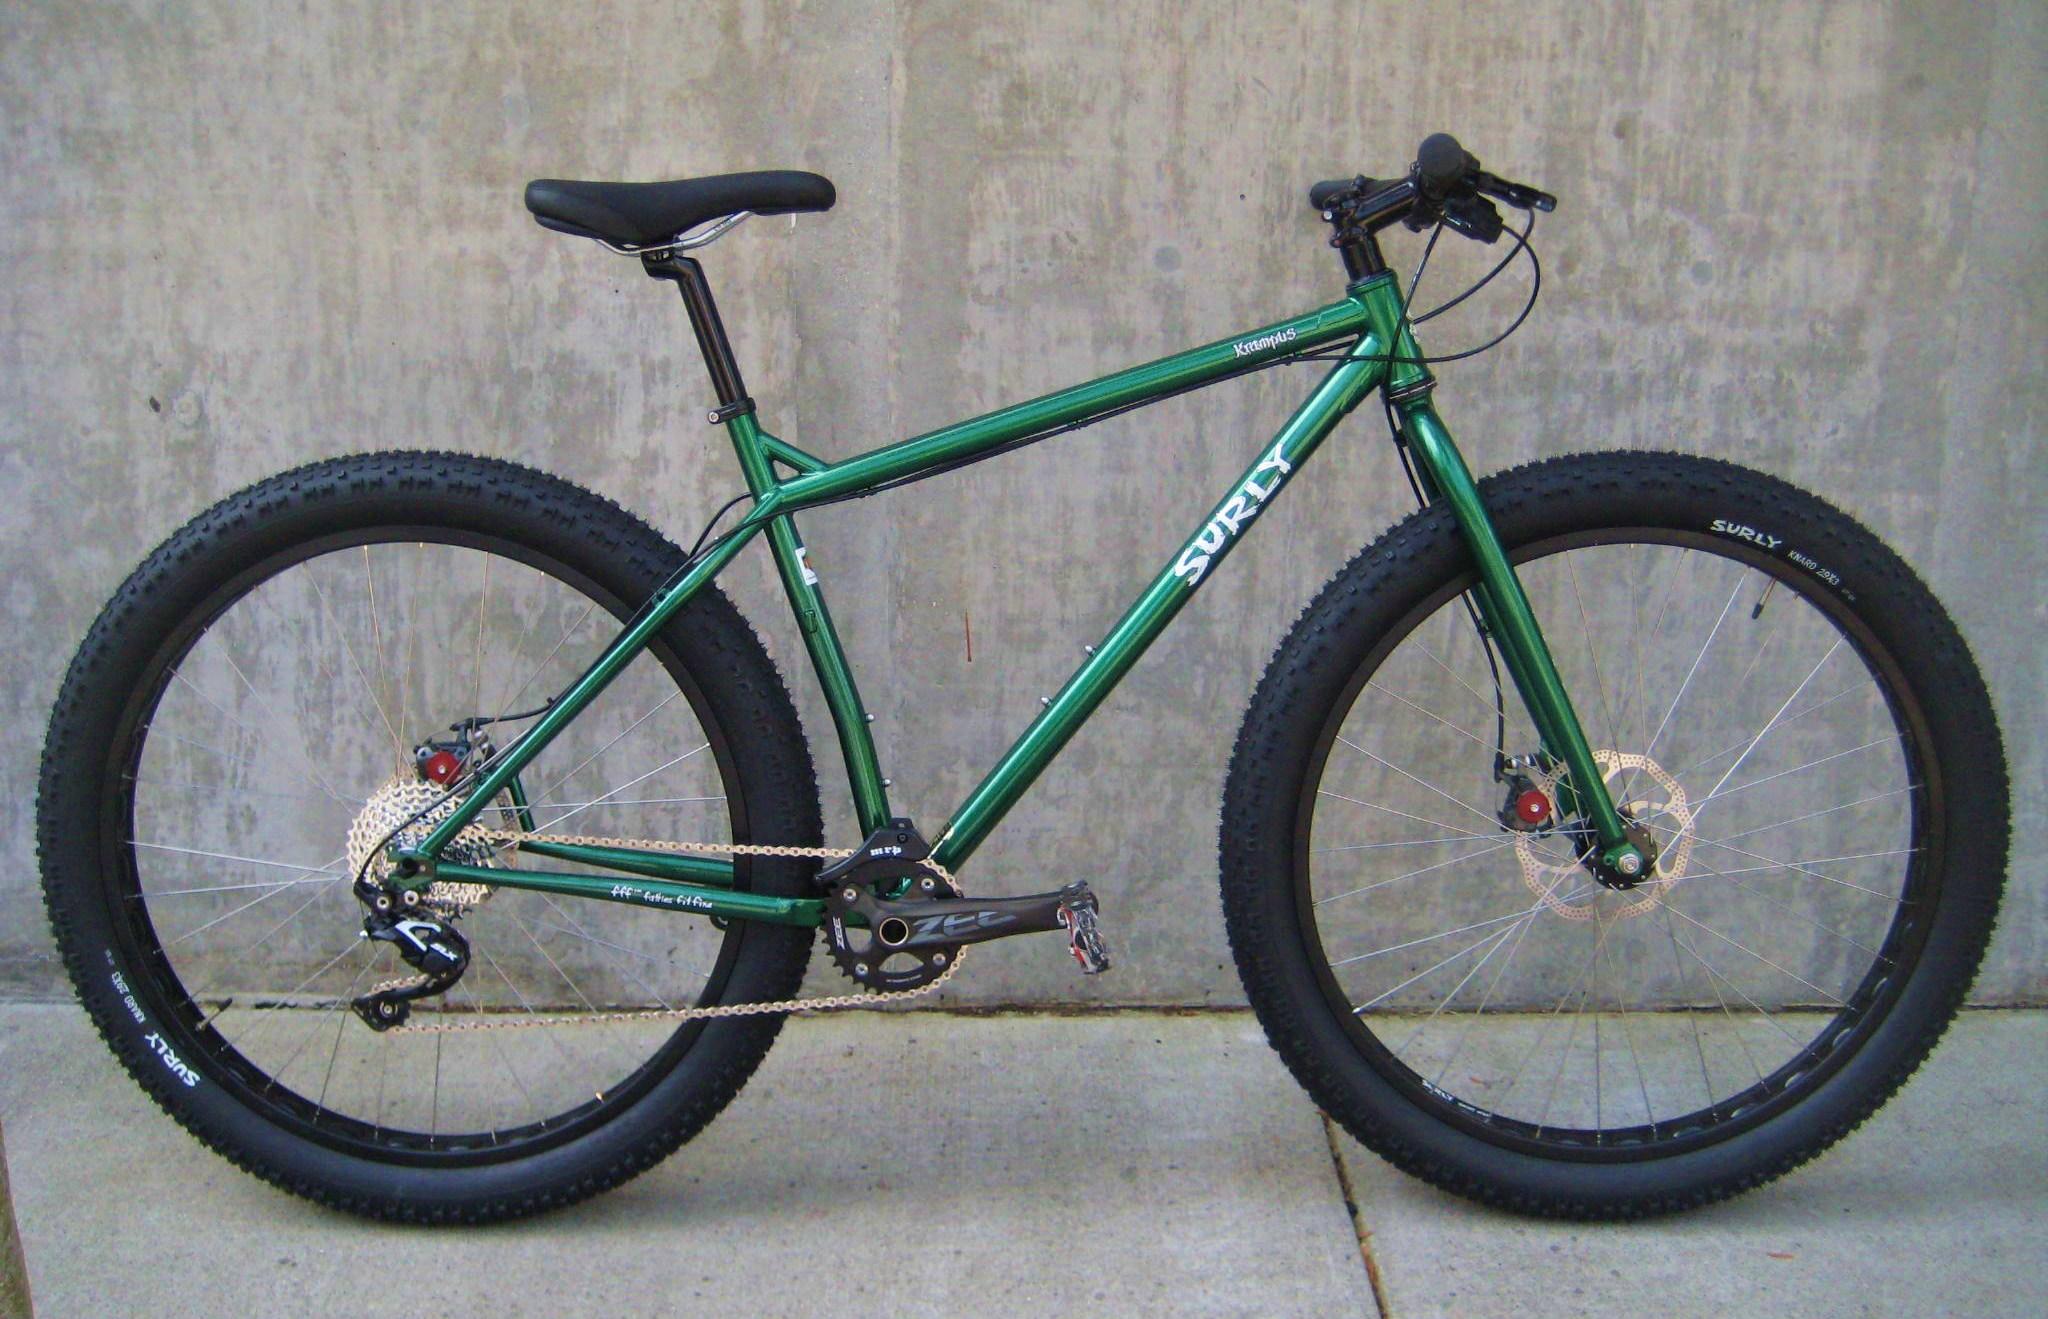 Surly Krampus Fat Bike At Classic Cycle Bainbridge Island